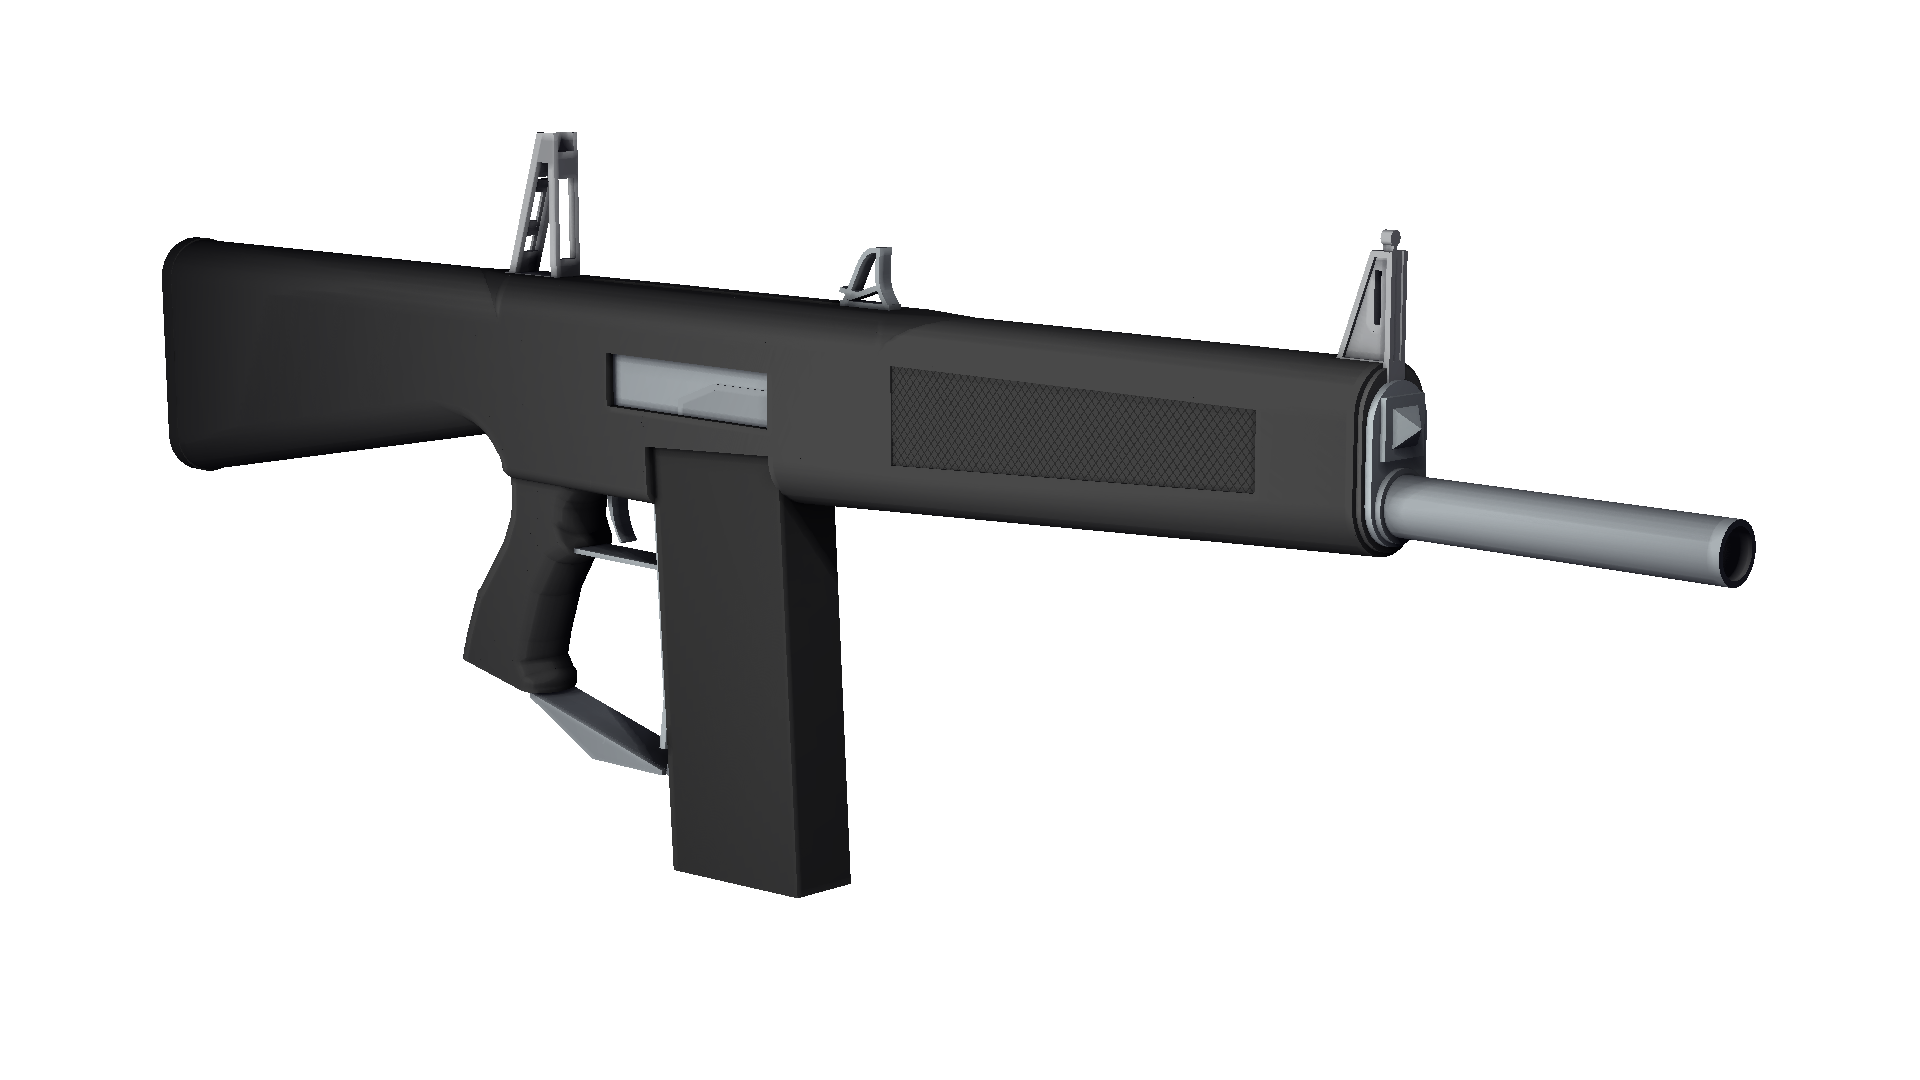 7_mar_21_guns-r_aa12q.png